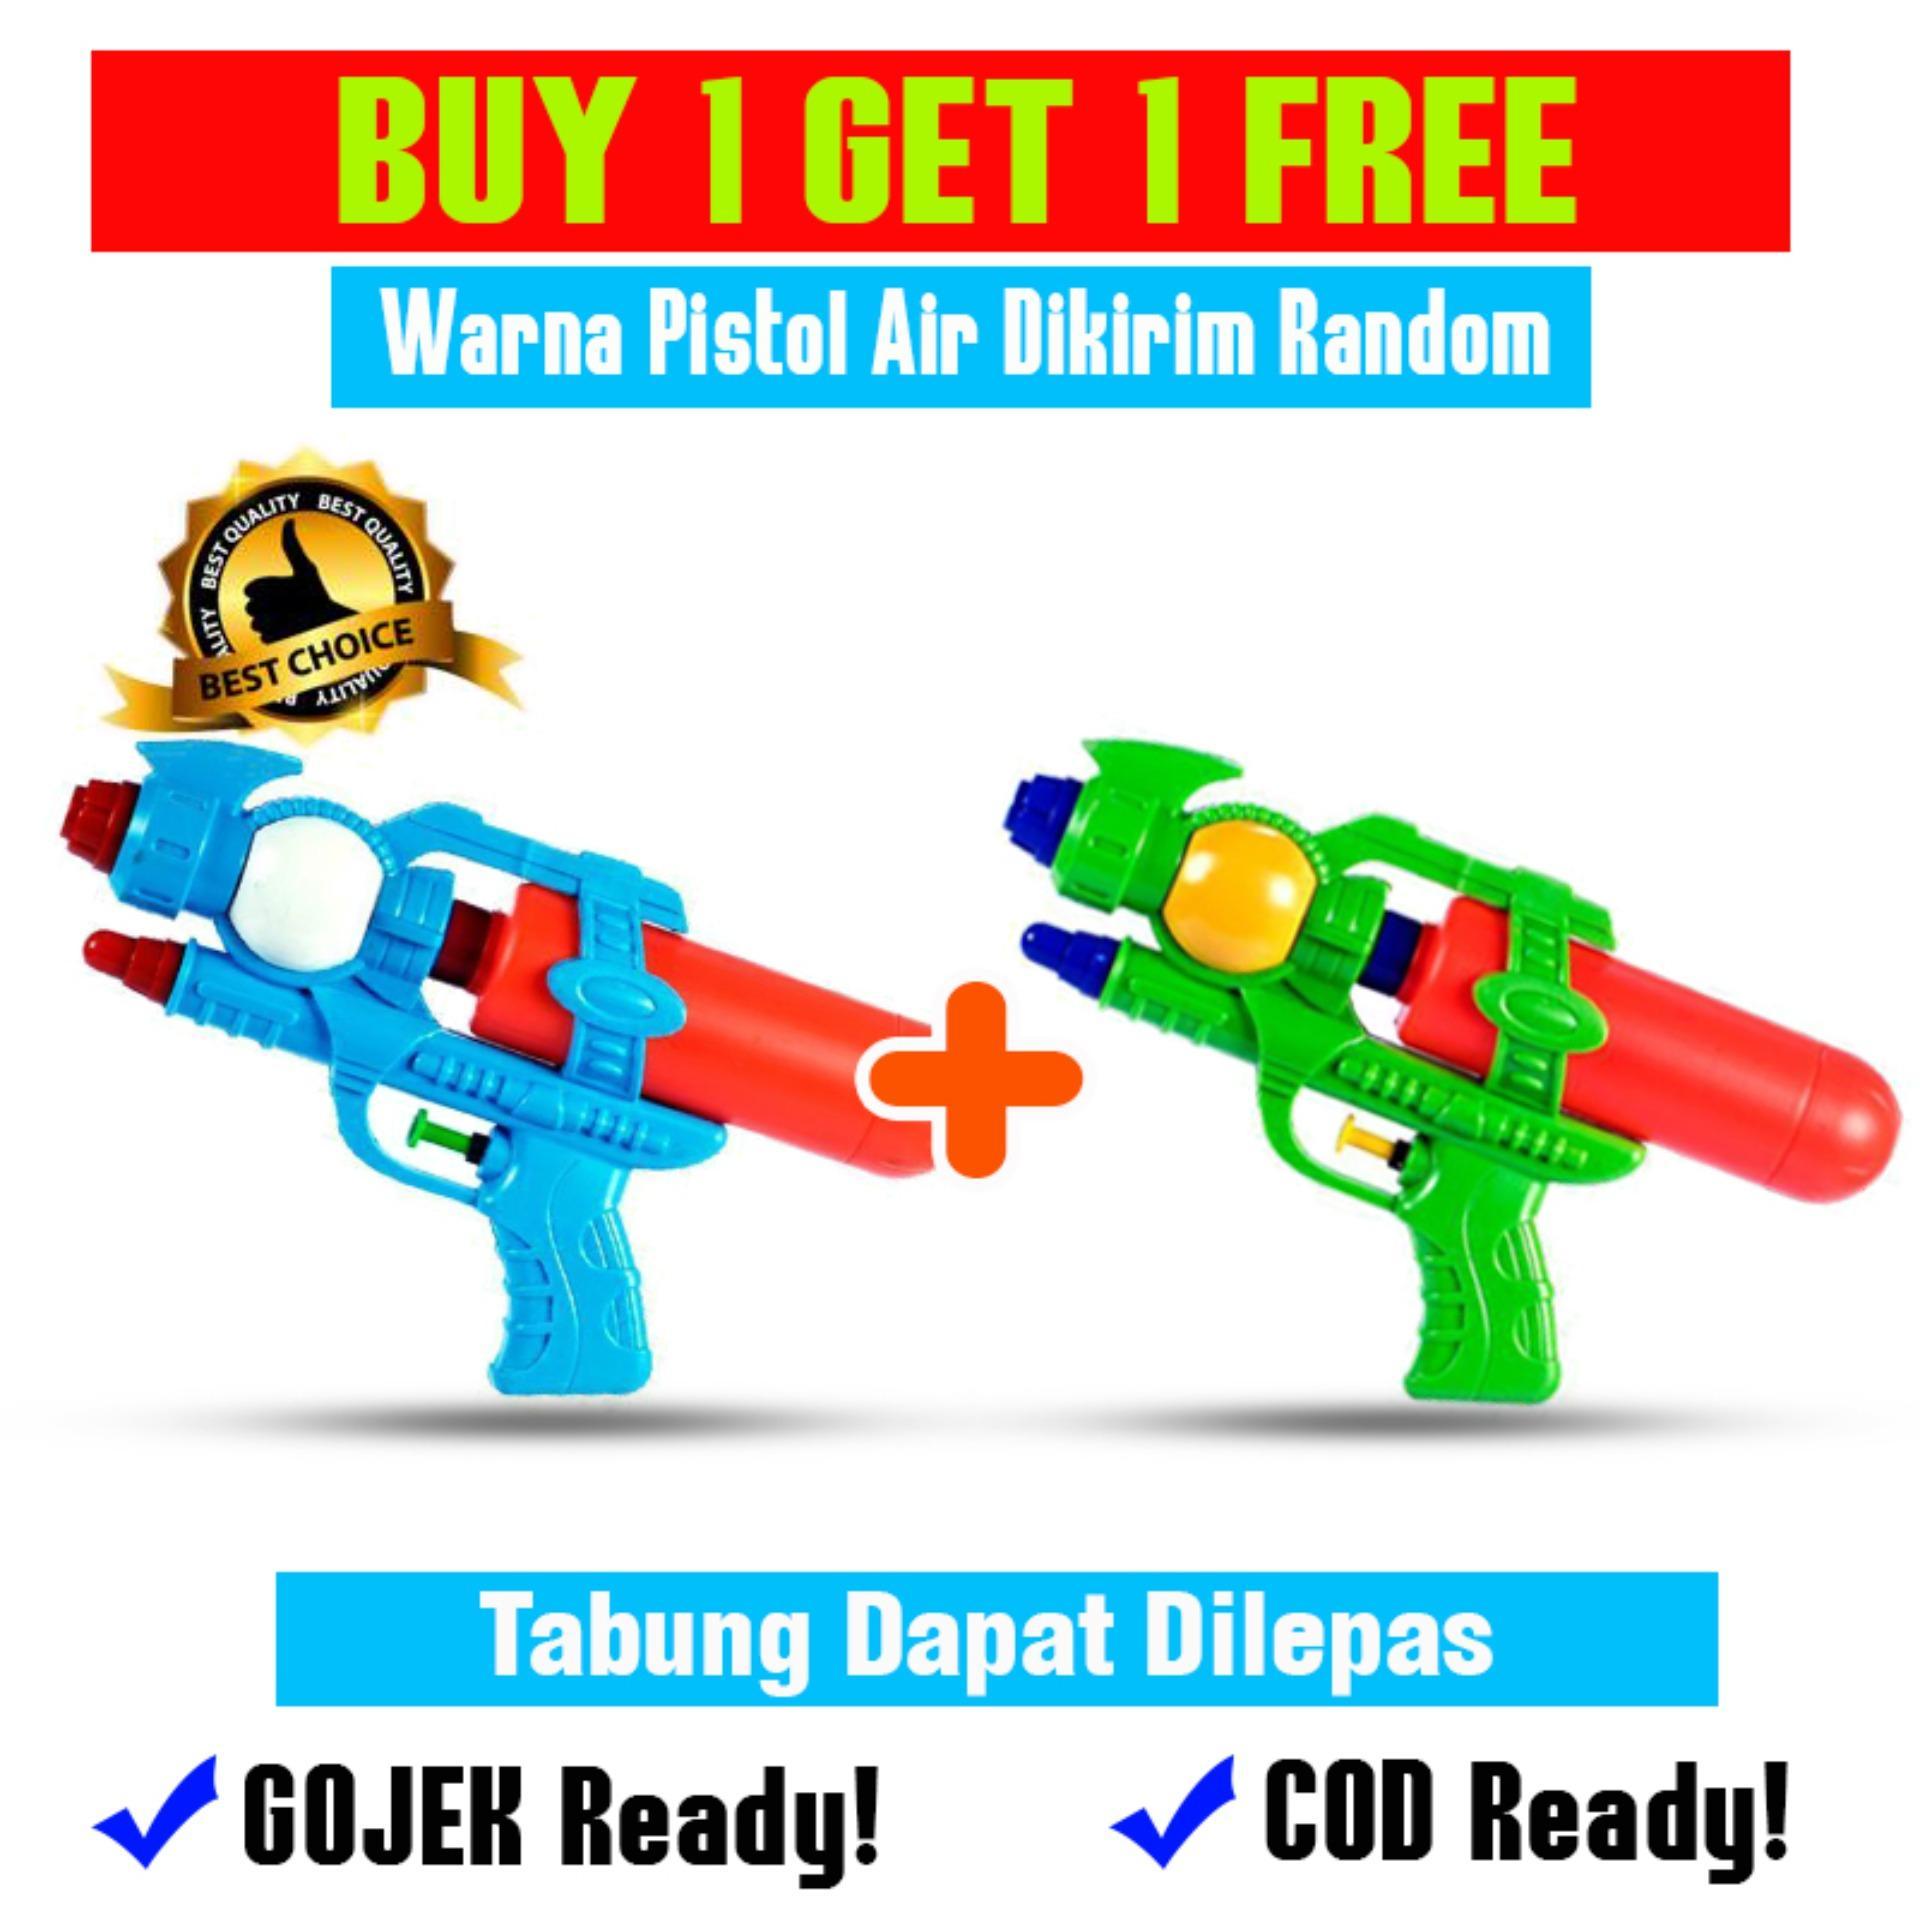 Mainan Anak Buy 1 Get 1 Free Pistol Air Mainan Anak - OCT8108 Multicolor